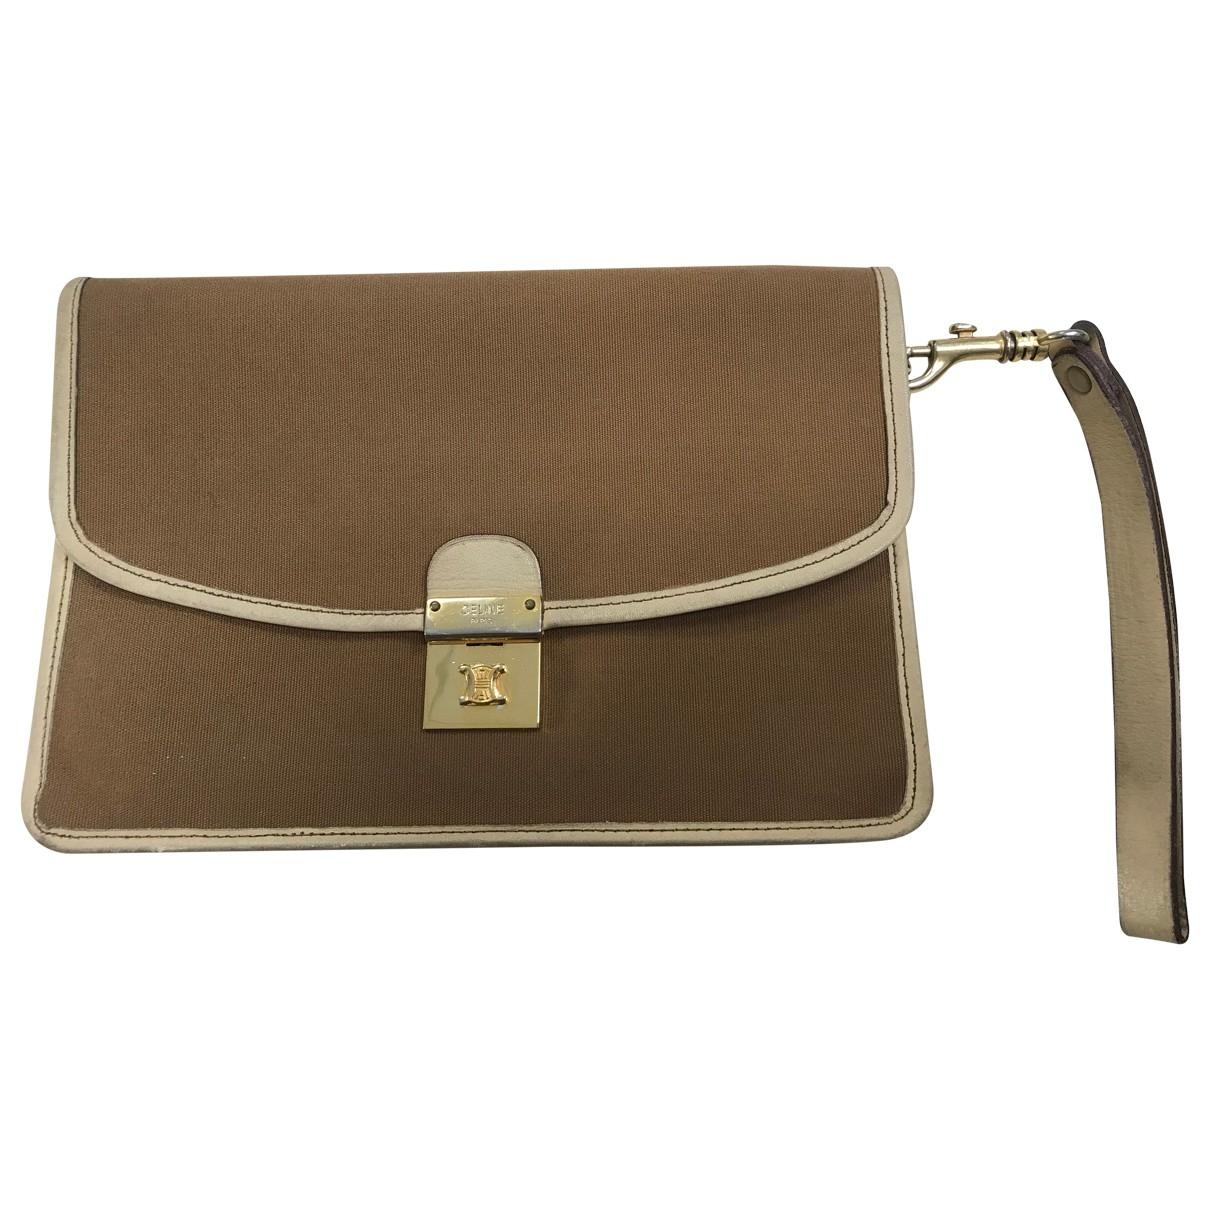 Celine \N Camel Cloth Clutch bag for Women \N